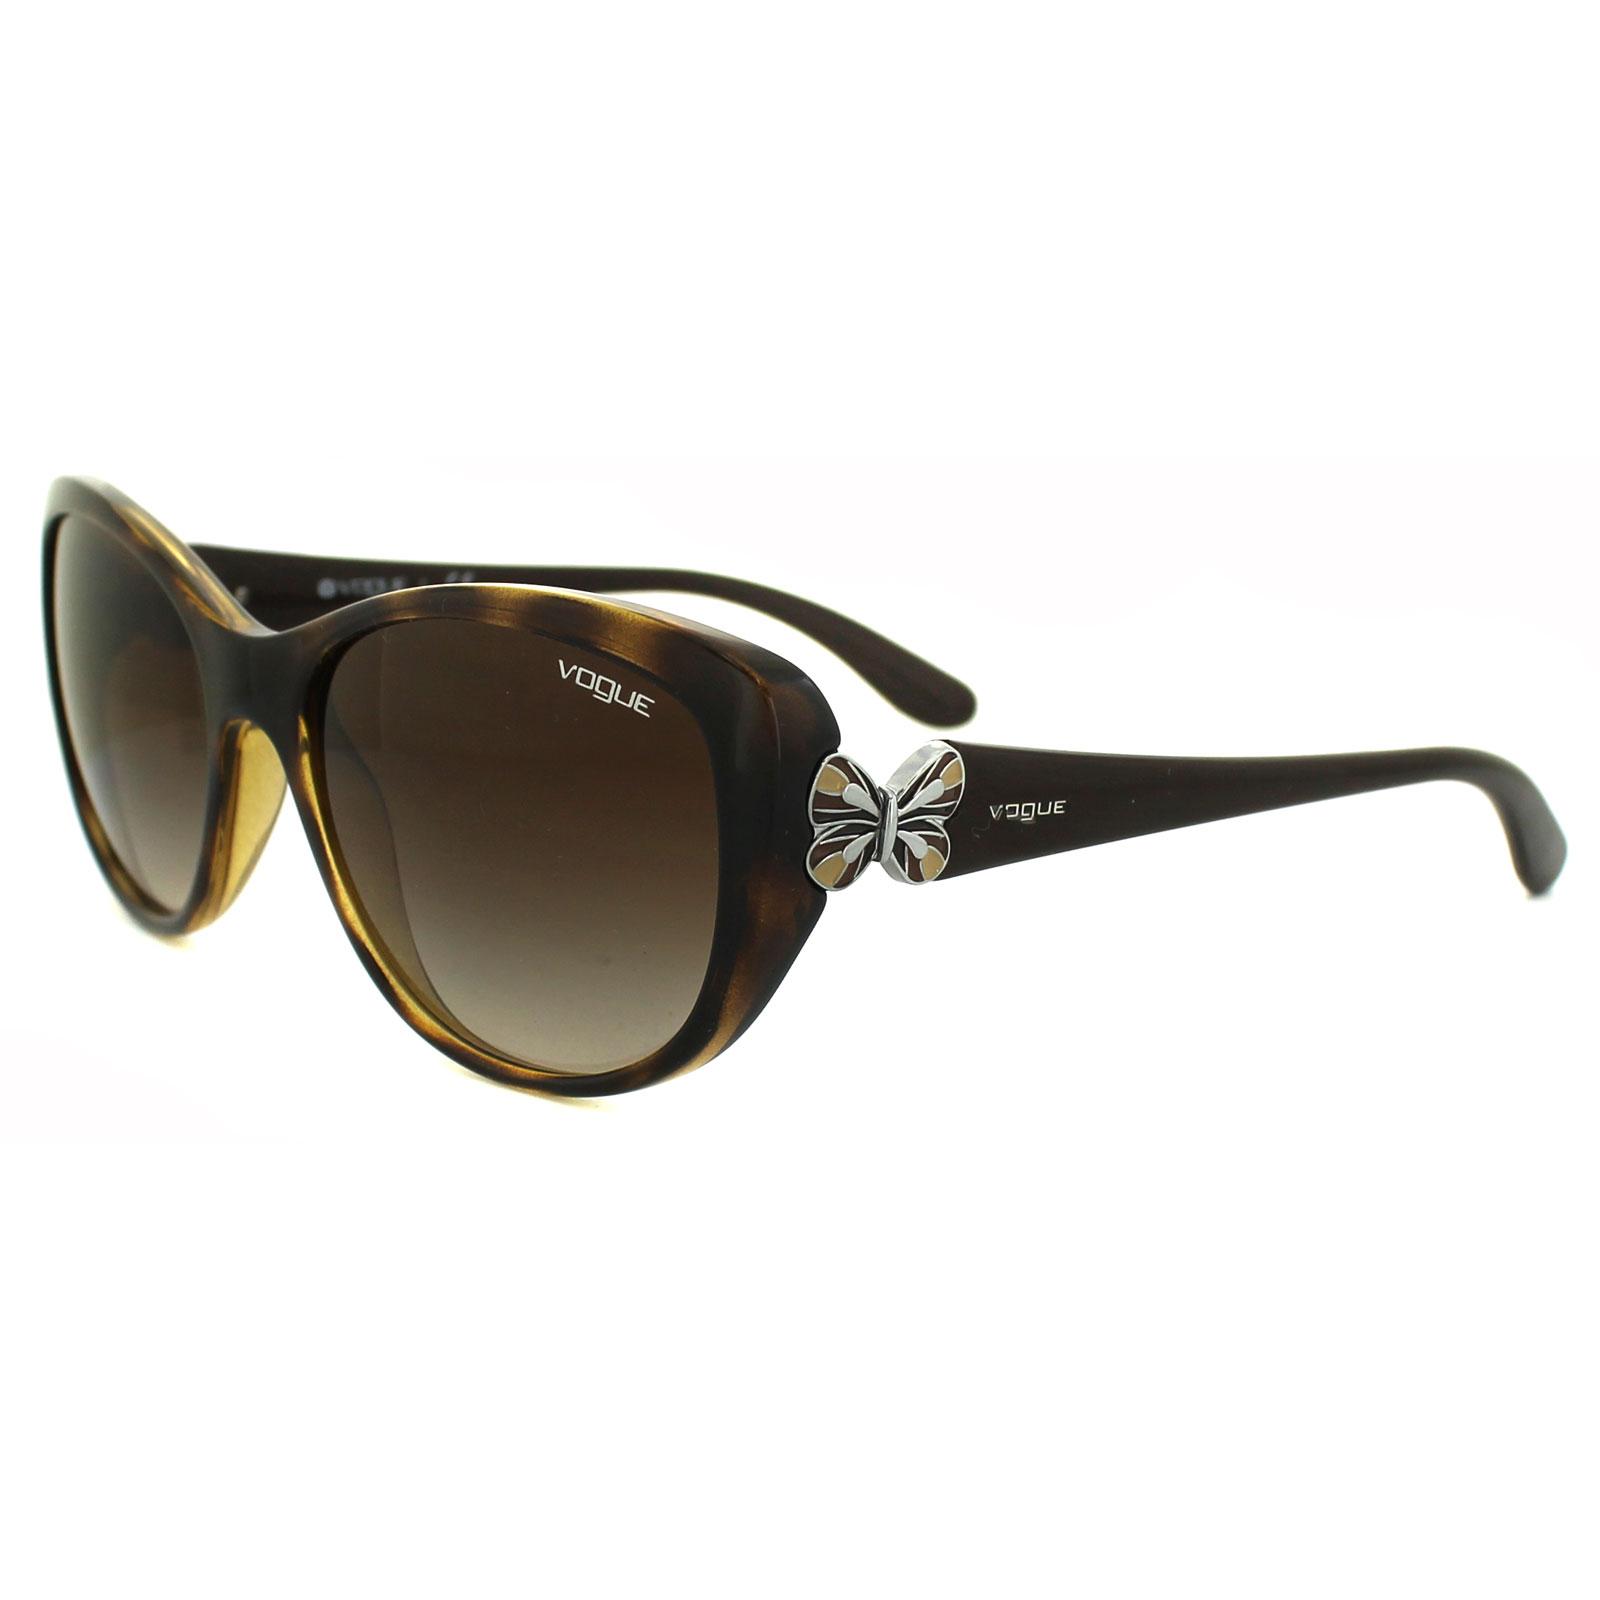 0669ac421c Sentinel Vogue Sunglasses 2944S W65613 Dark Havana Brown Gradient